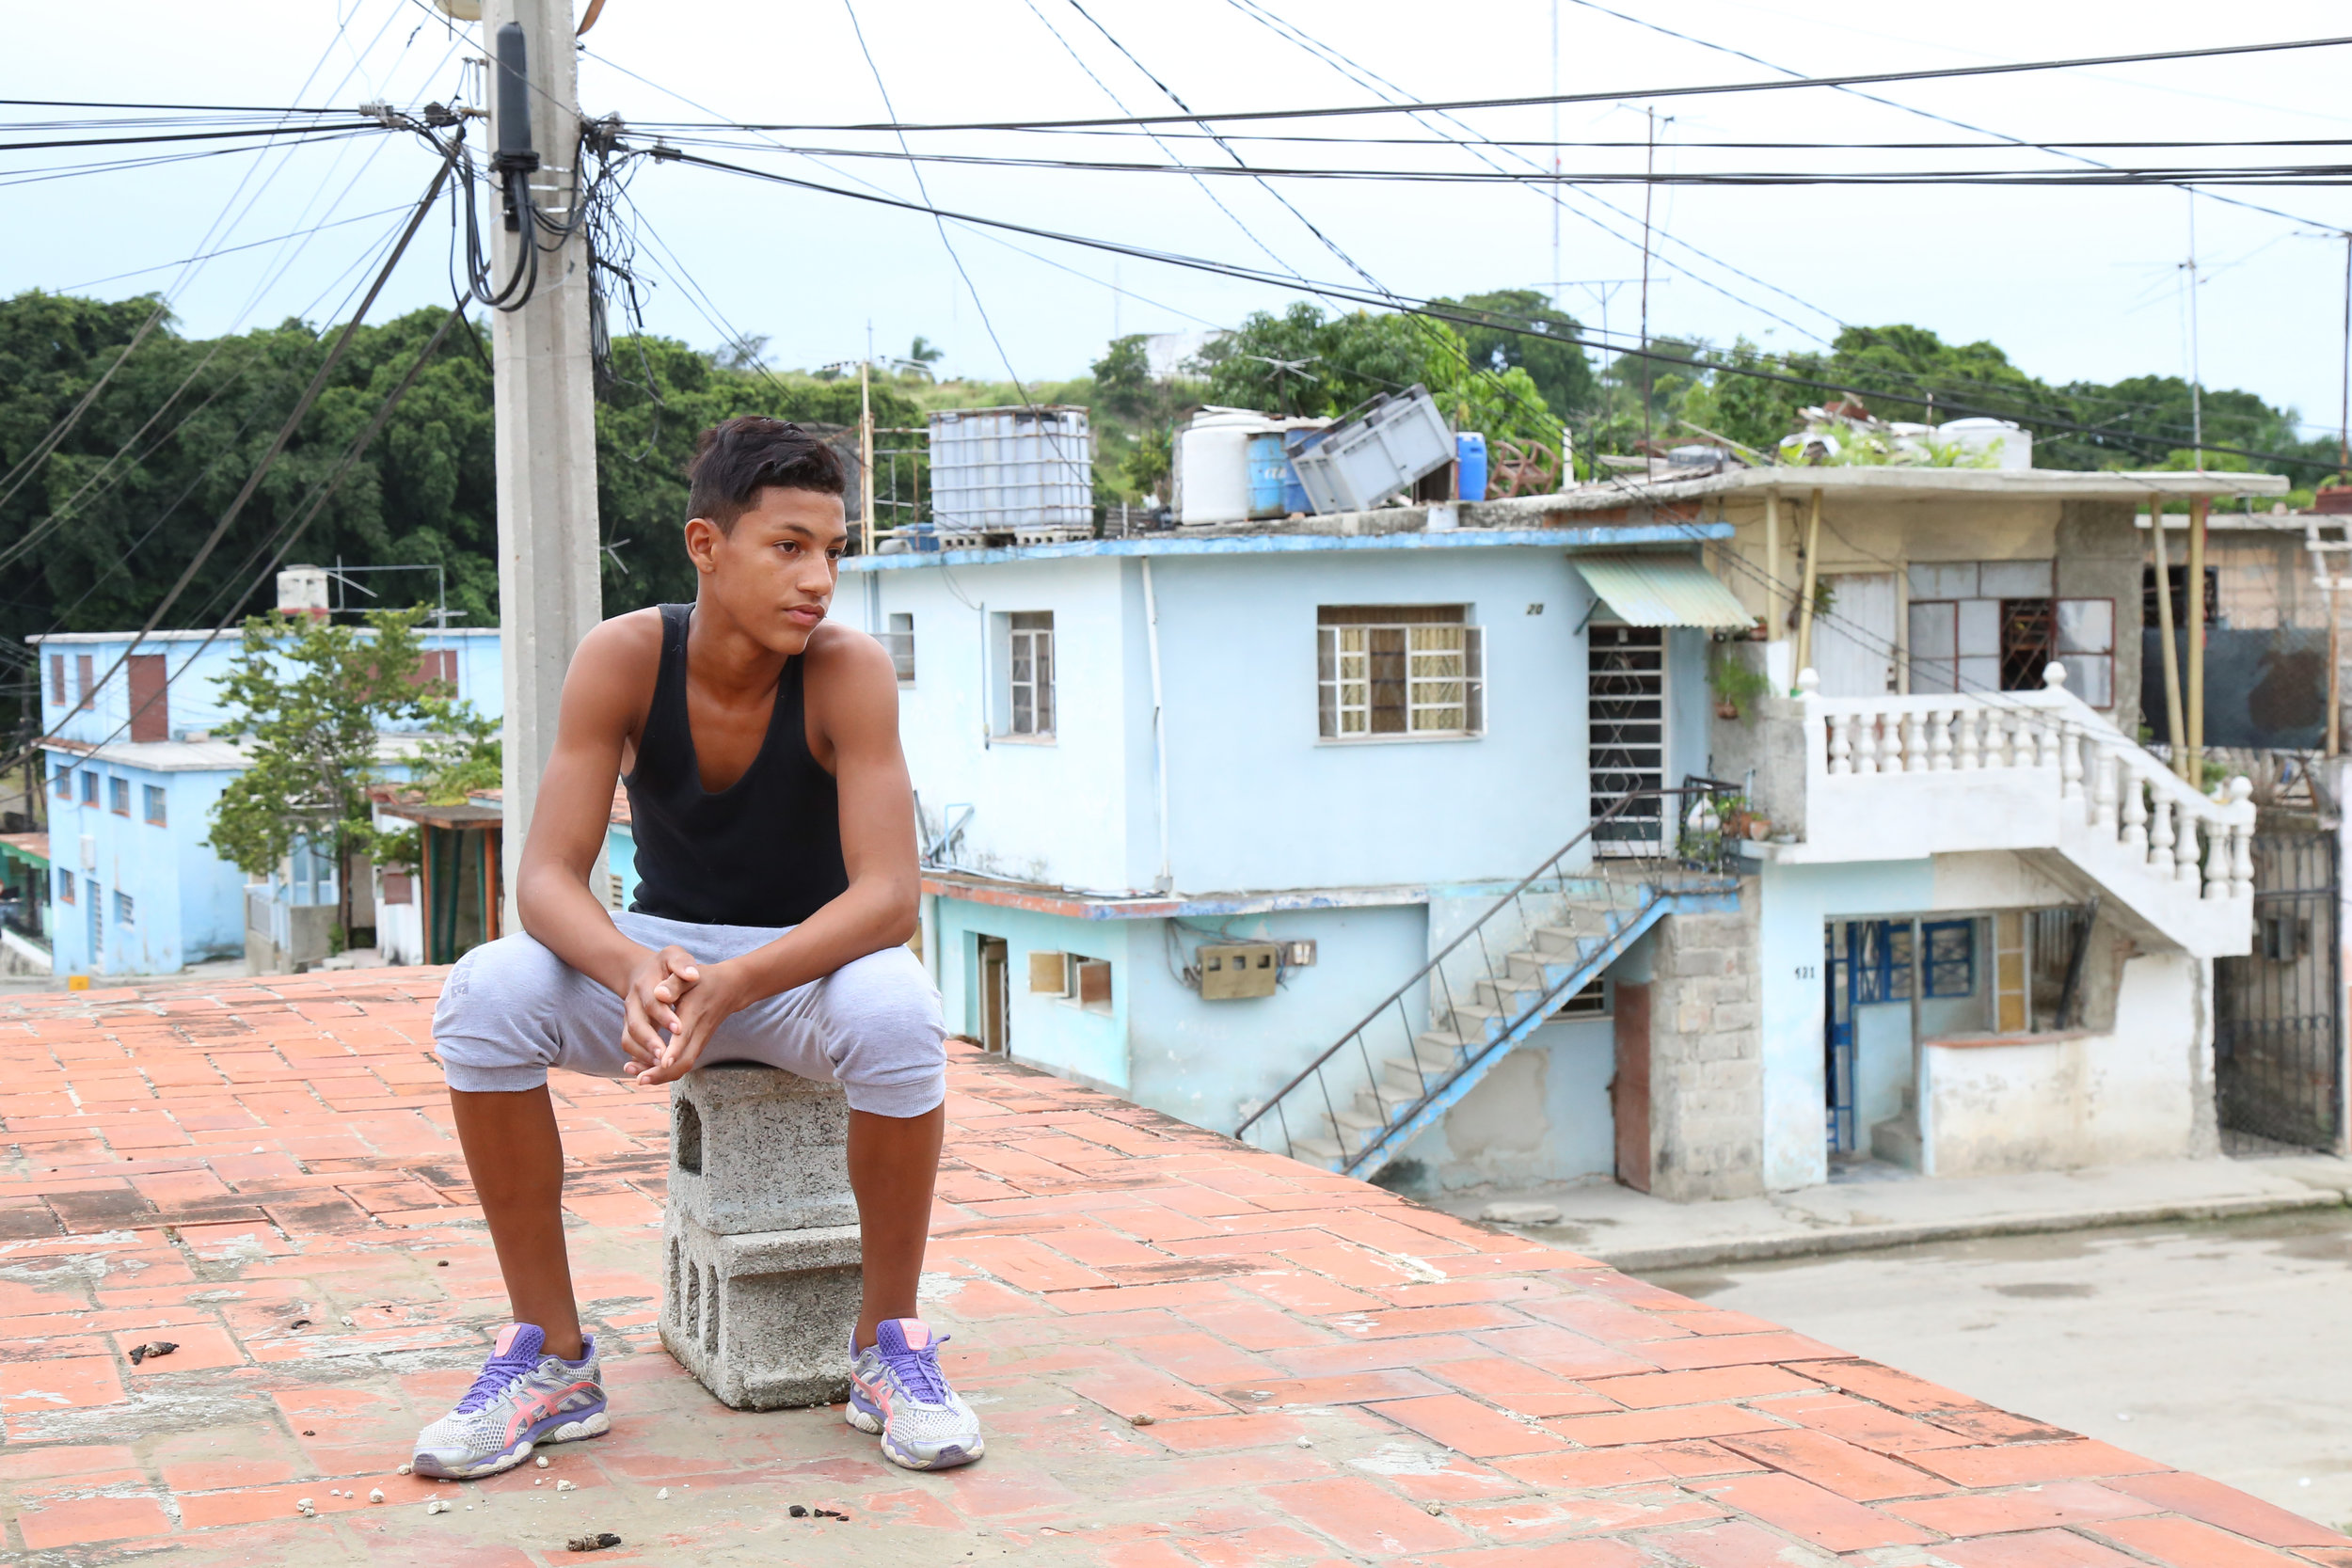 GeoAdo_Cuba_Livan-6.jpg